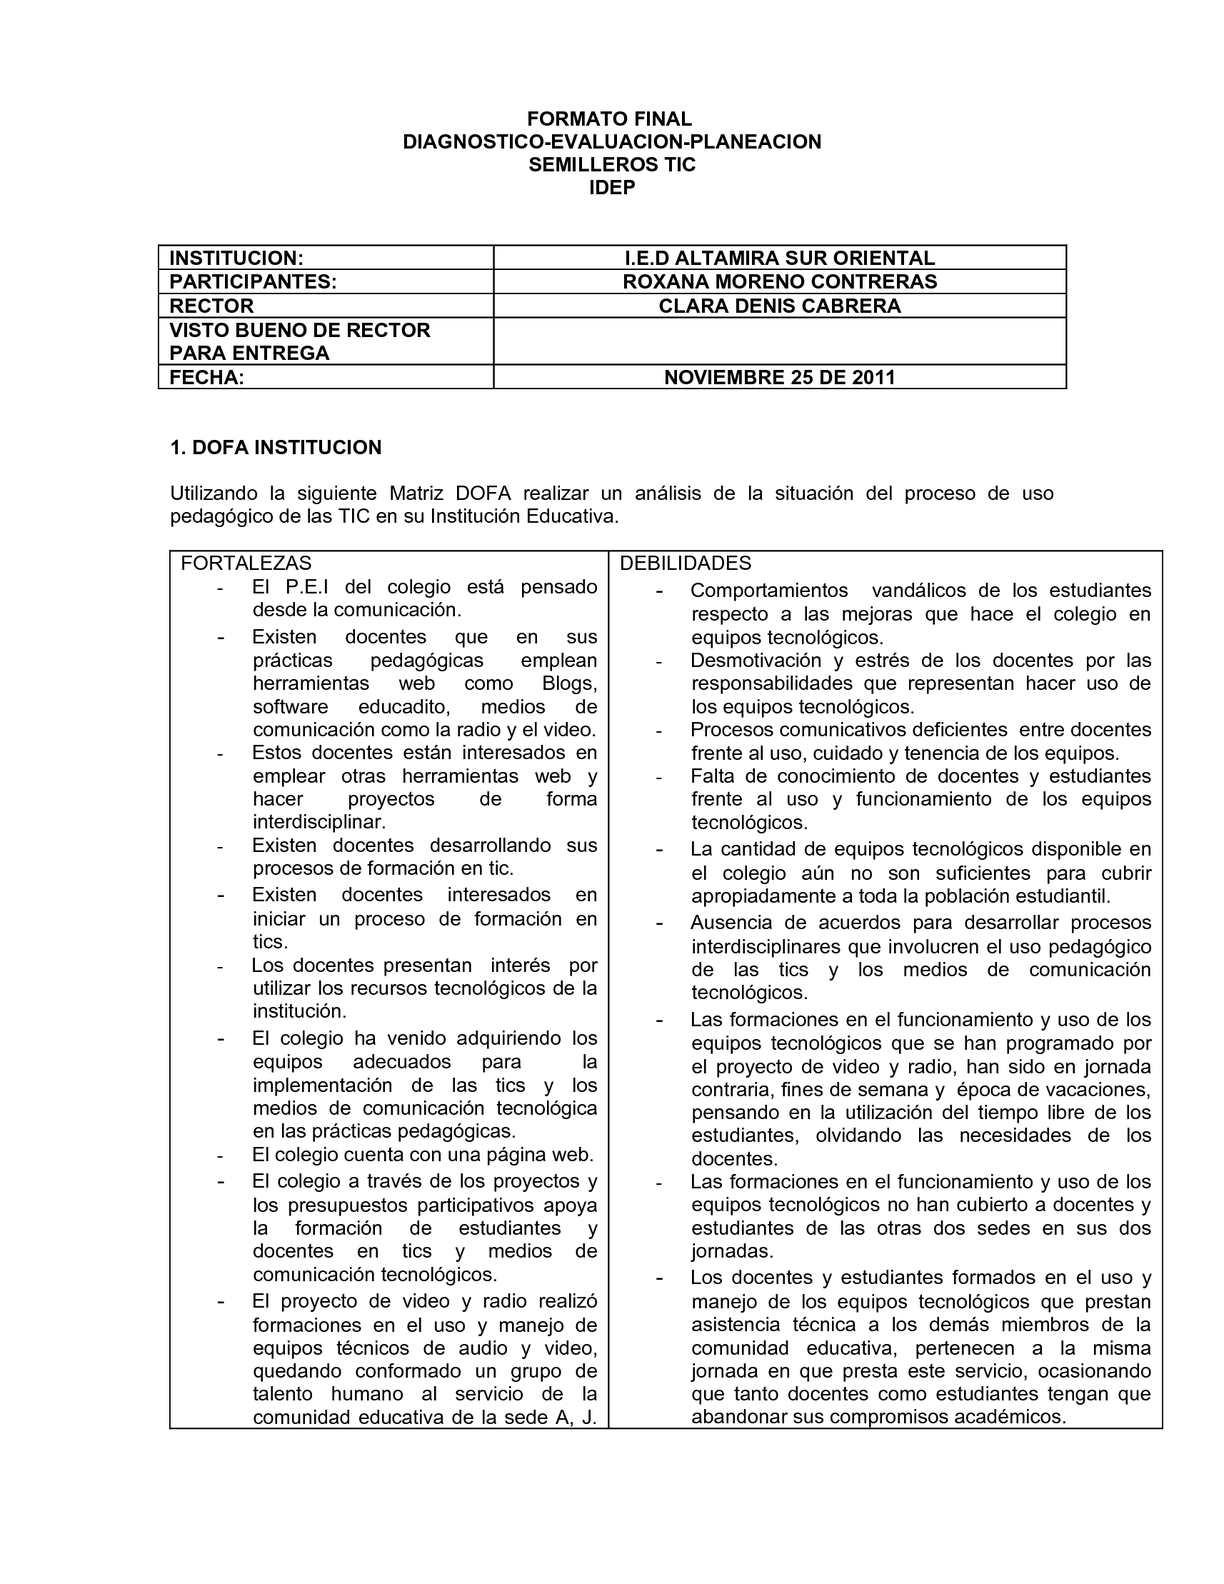 FORMATO DE DIAGNOSTICO-PLANEACION